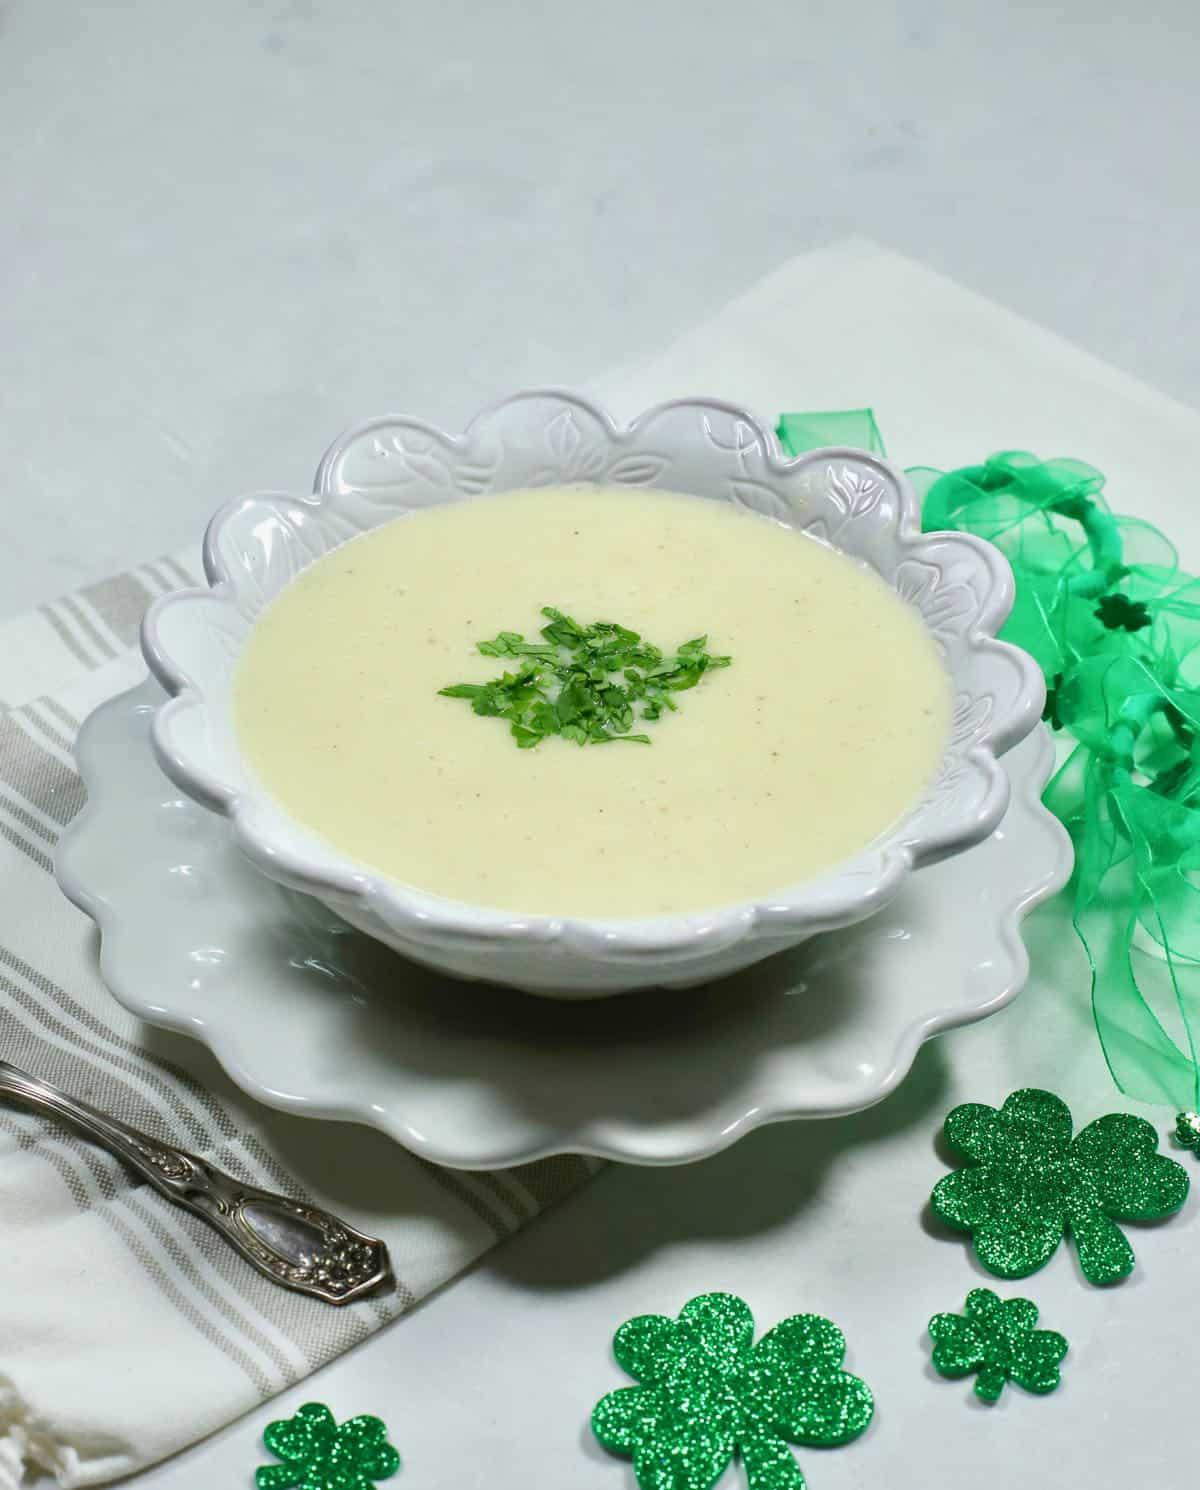 A white bowl full of potato soup with green shamrocks.